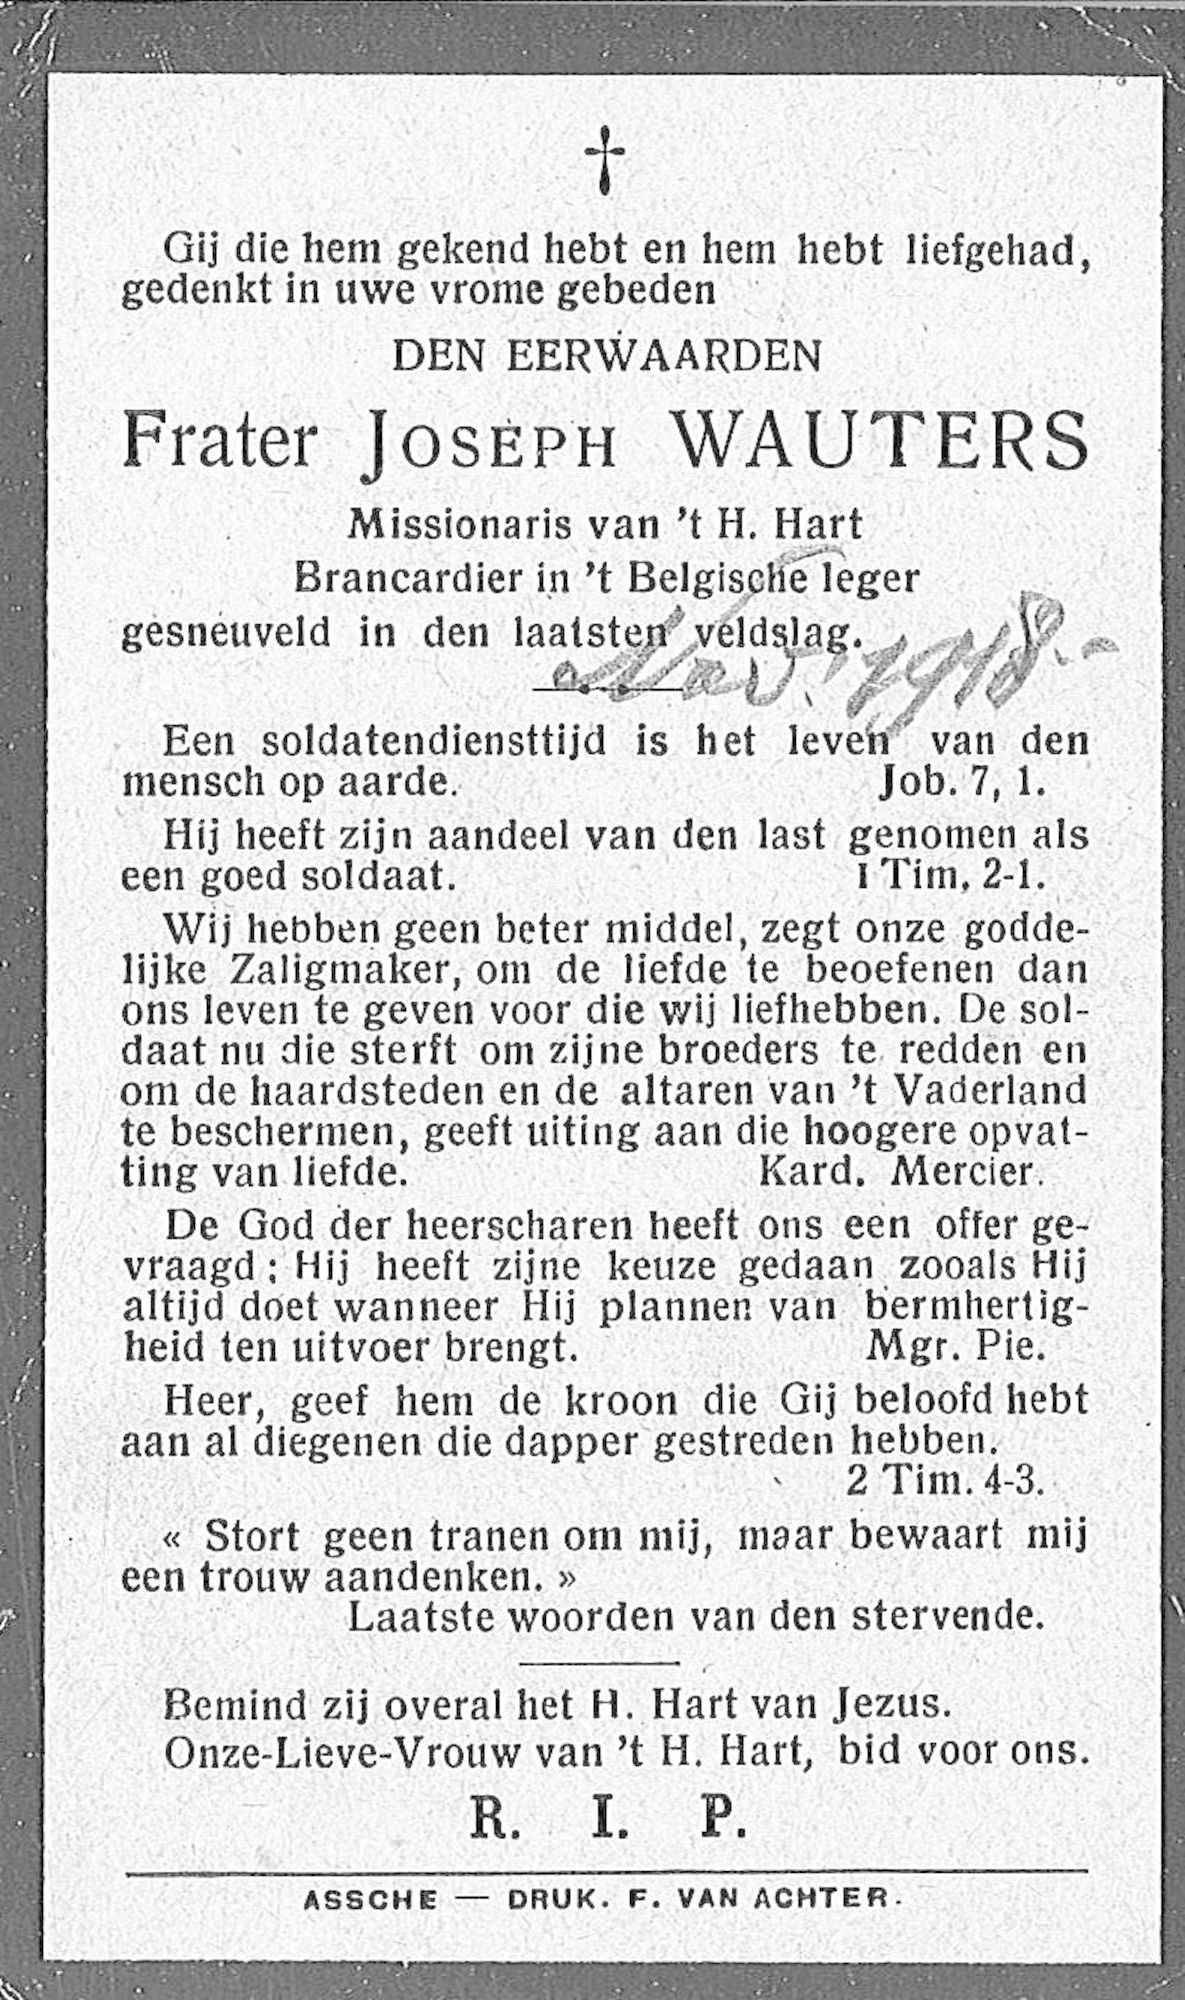 Joseph Wauters